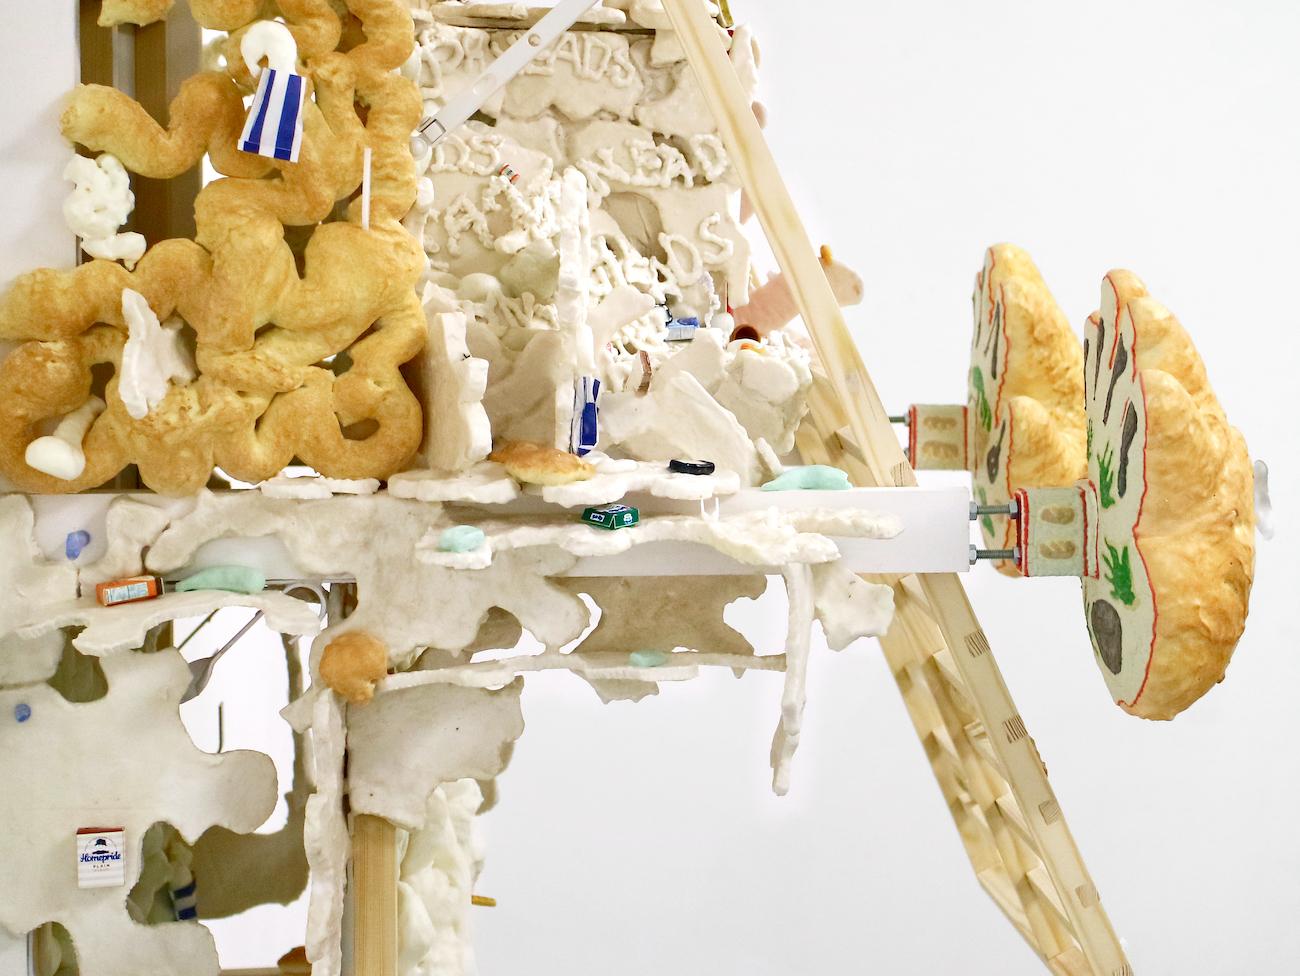 Kara Chin, Bread Hands House (detail), 2021. Mixed Media*. 113 x 80 x 65 cm. Photographer: Harley Kuyck-Cohen.